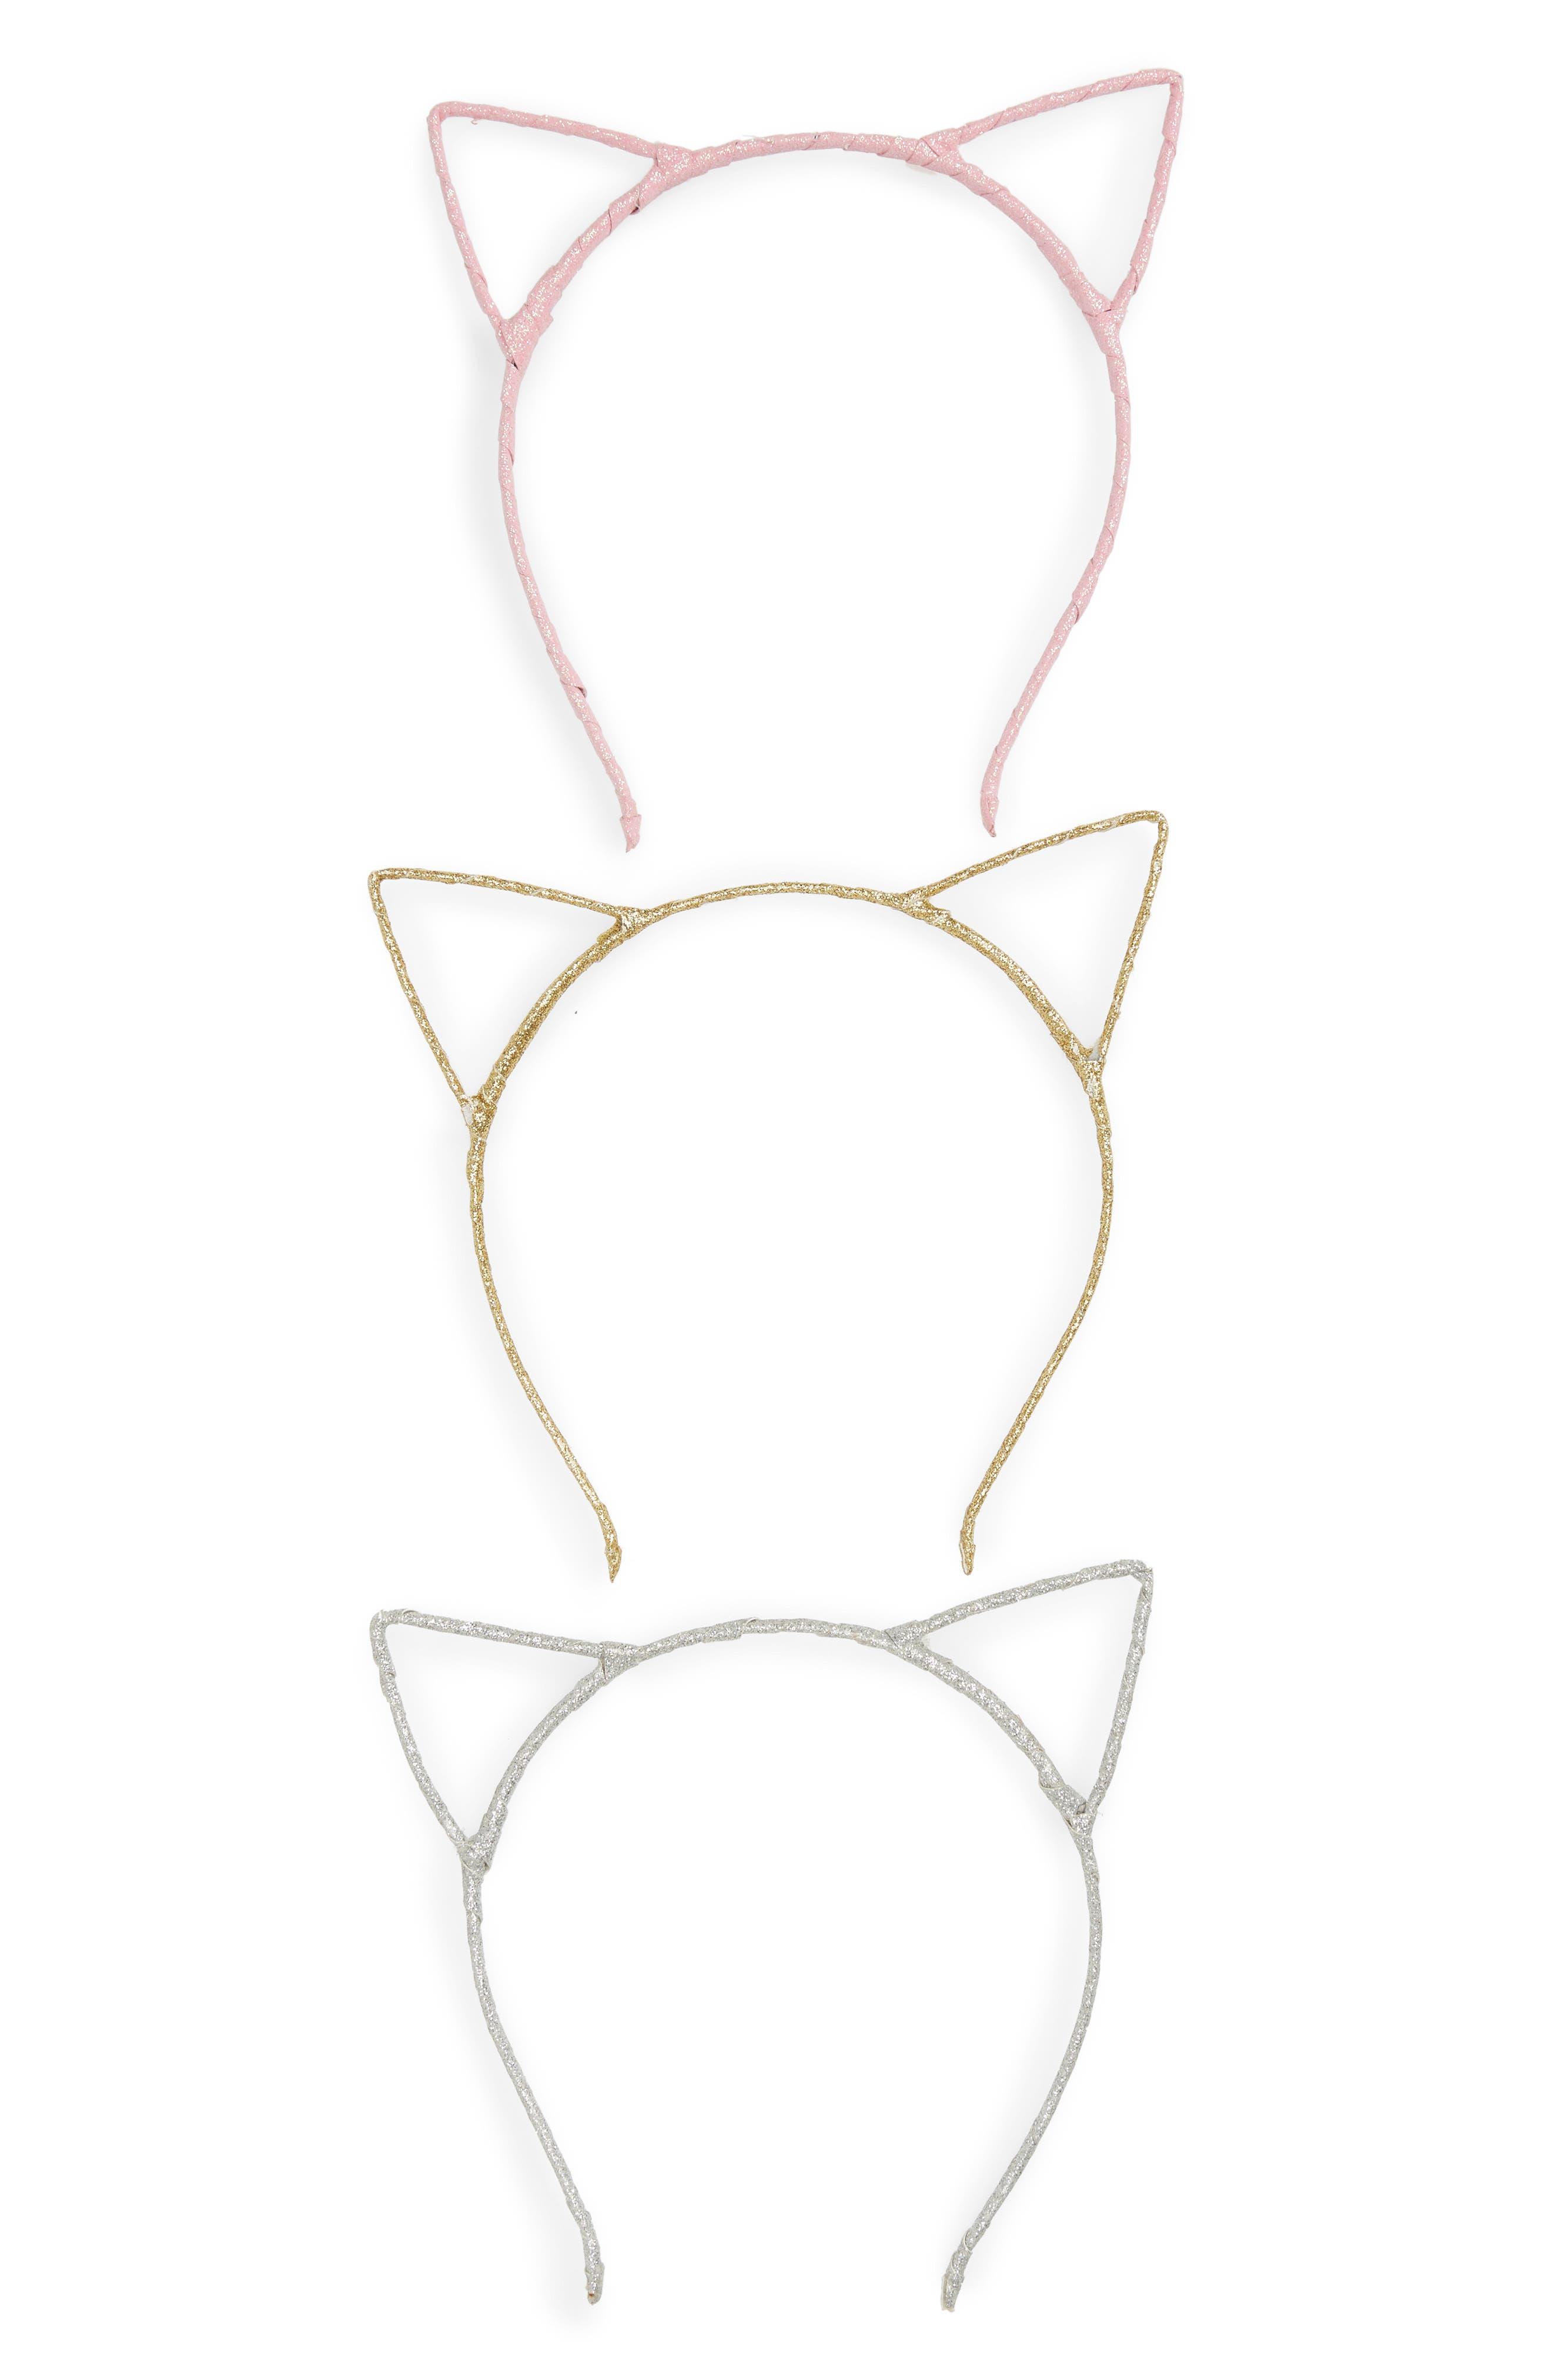 Glitter Cat 3-Pack Headband Set,                             Main thumbnail 1, color,                             GOLD COMBO